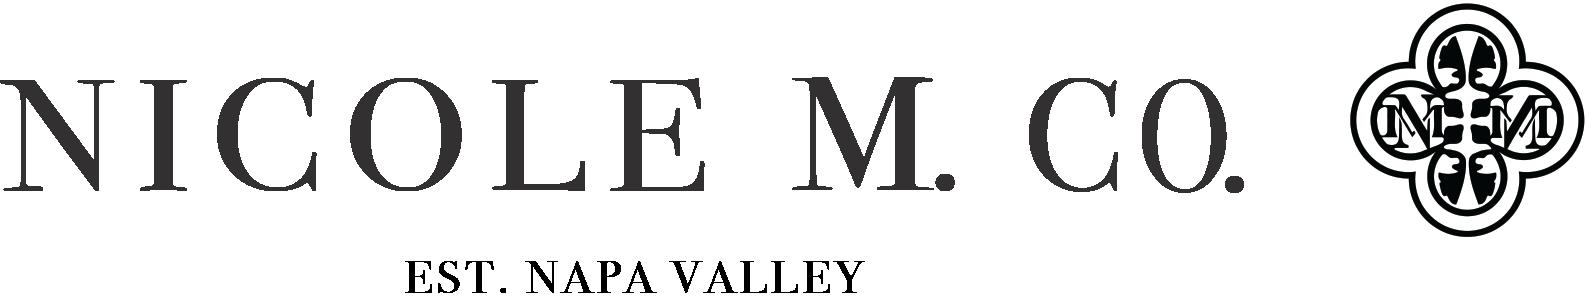 Nicole m co logo finalnapa2018revisedwordsandmark.png